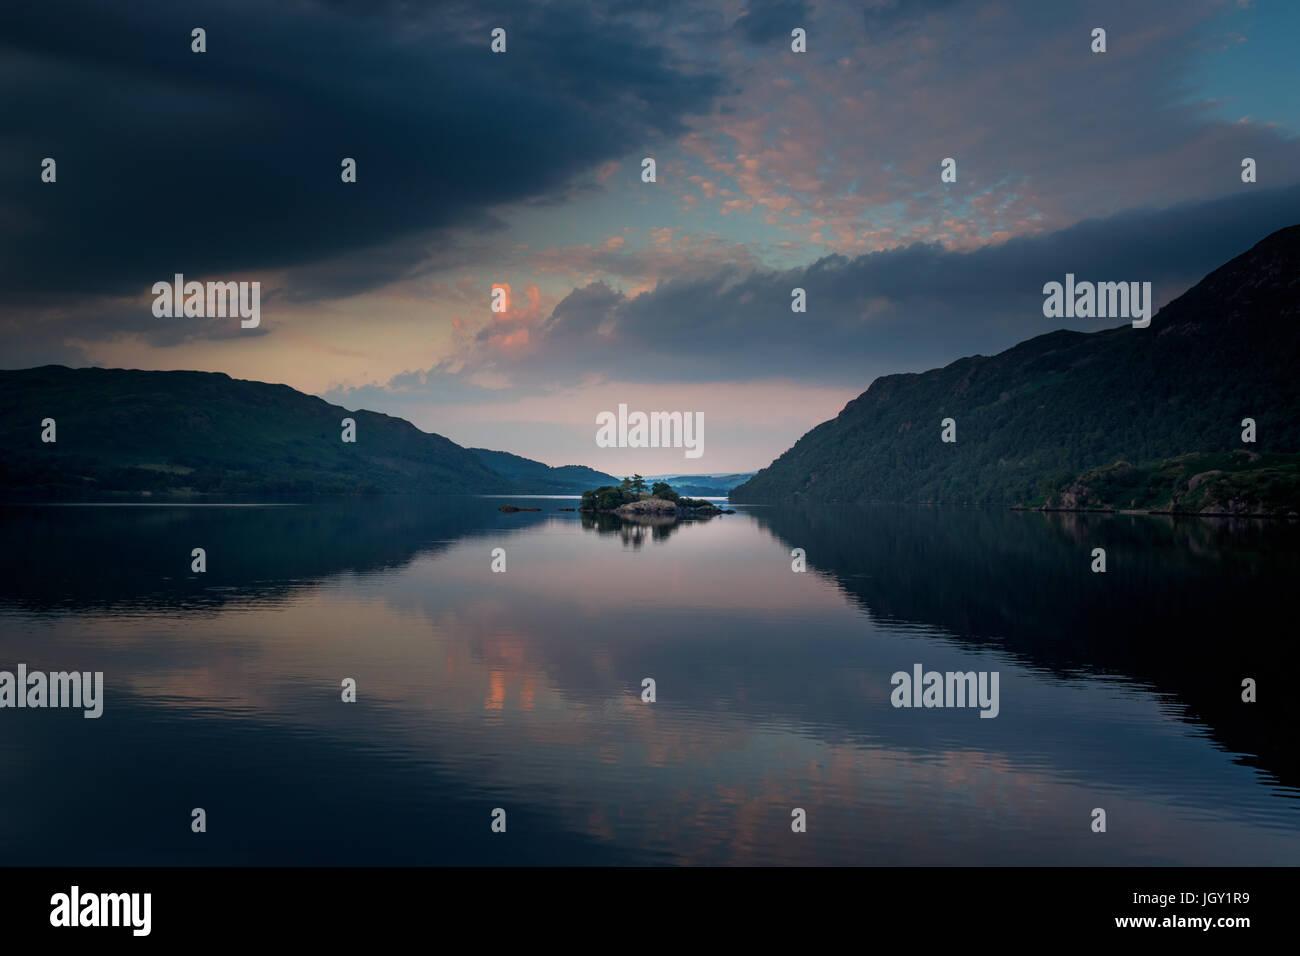 Ullswater sunset, The Lake District, UK - Stock Image